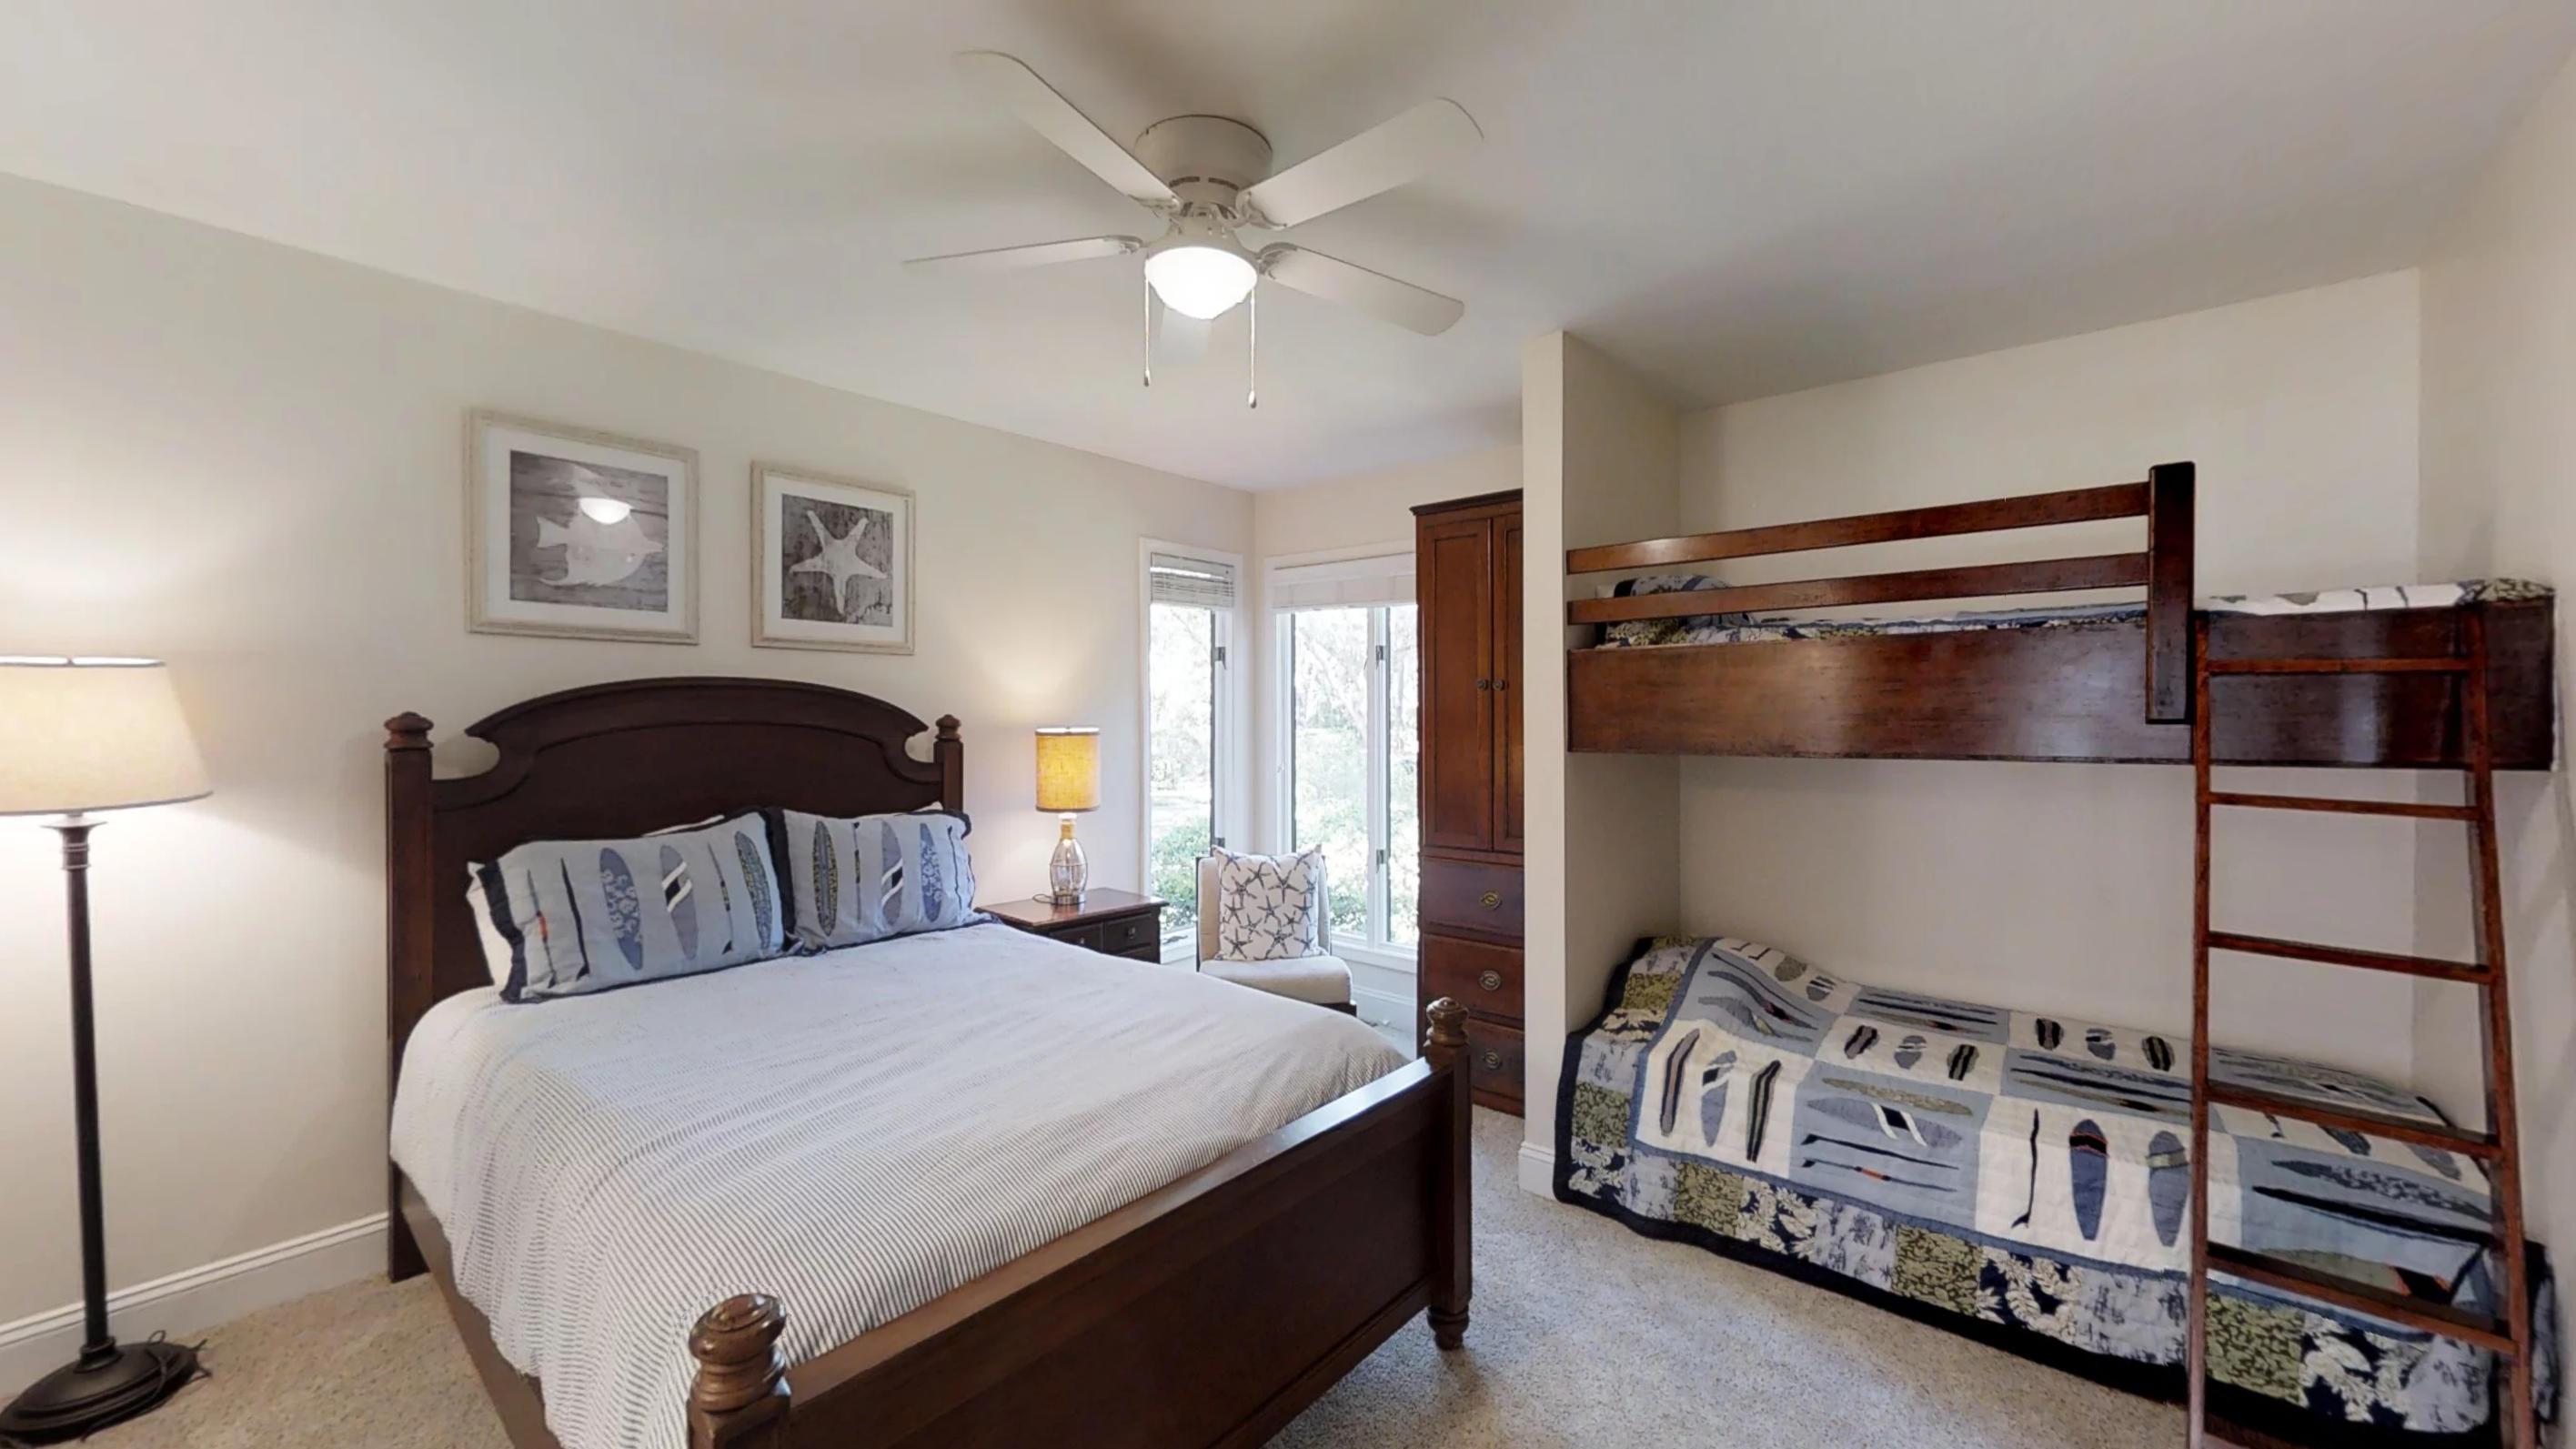 Kiawah Island Homes For Sale - 4511 Park Lake, Kiawah Island, SC - 14